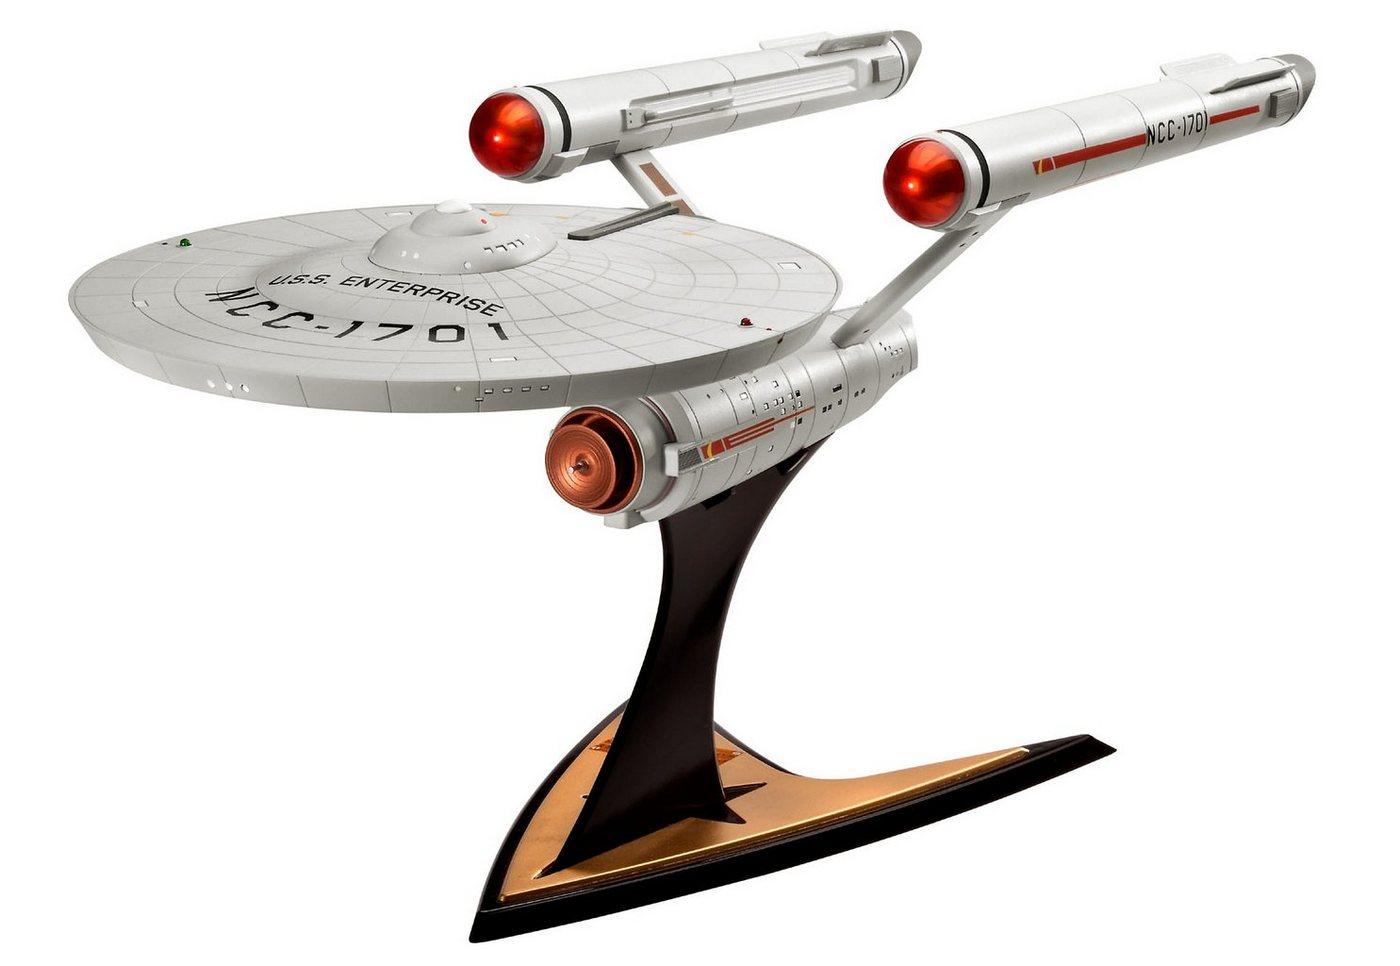 Revell® Modellbausatz Raumschiff, »Star Trek - U.S.S. Enterprise NCC-1701«, 1:600